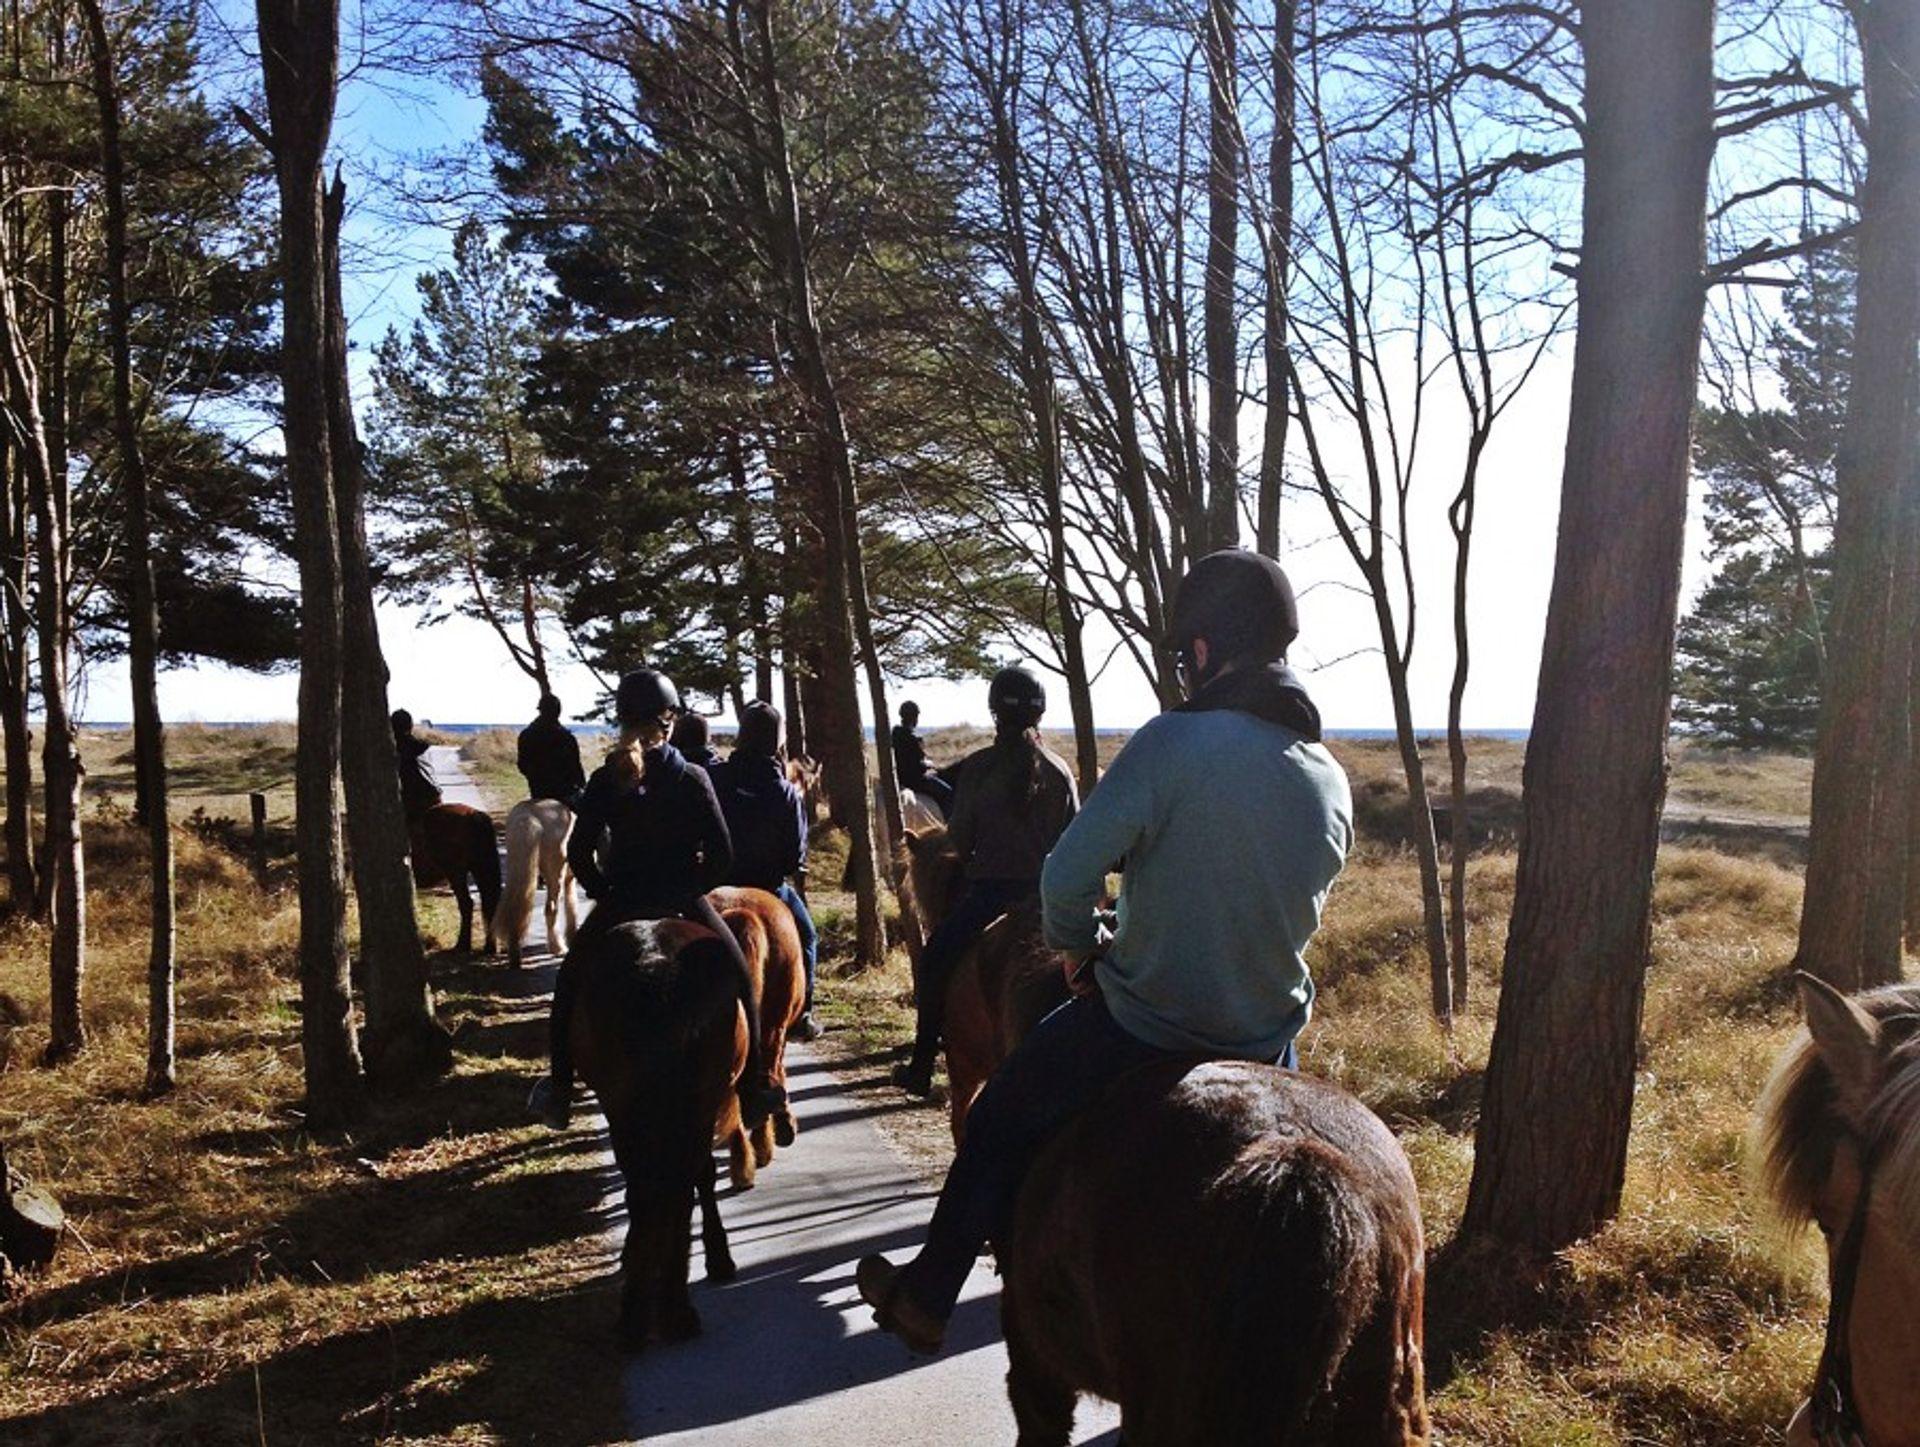 Horse riding through the forest in Fårö